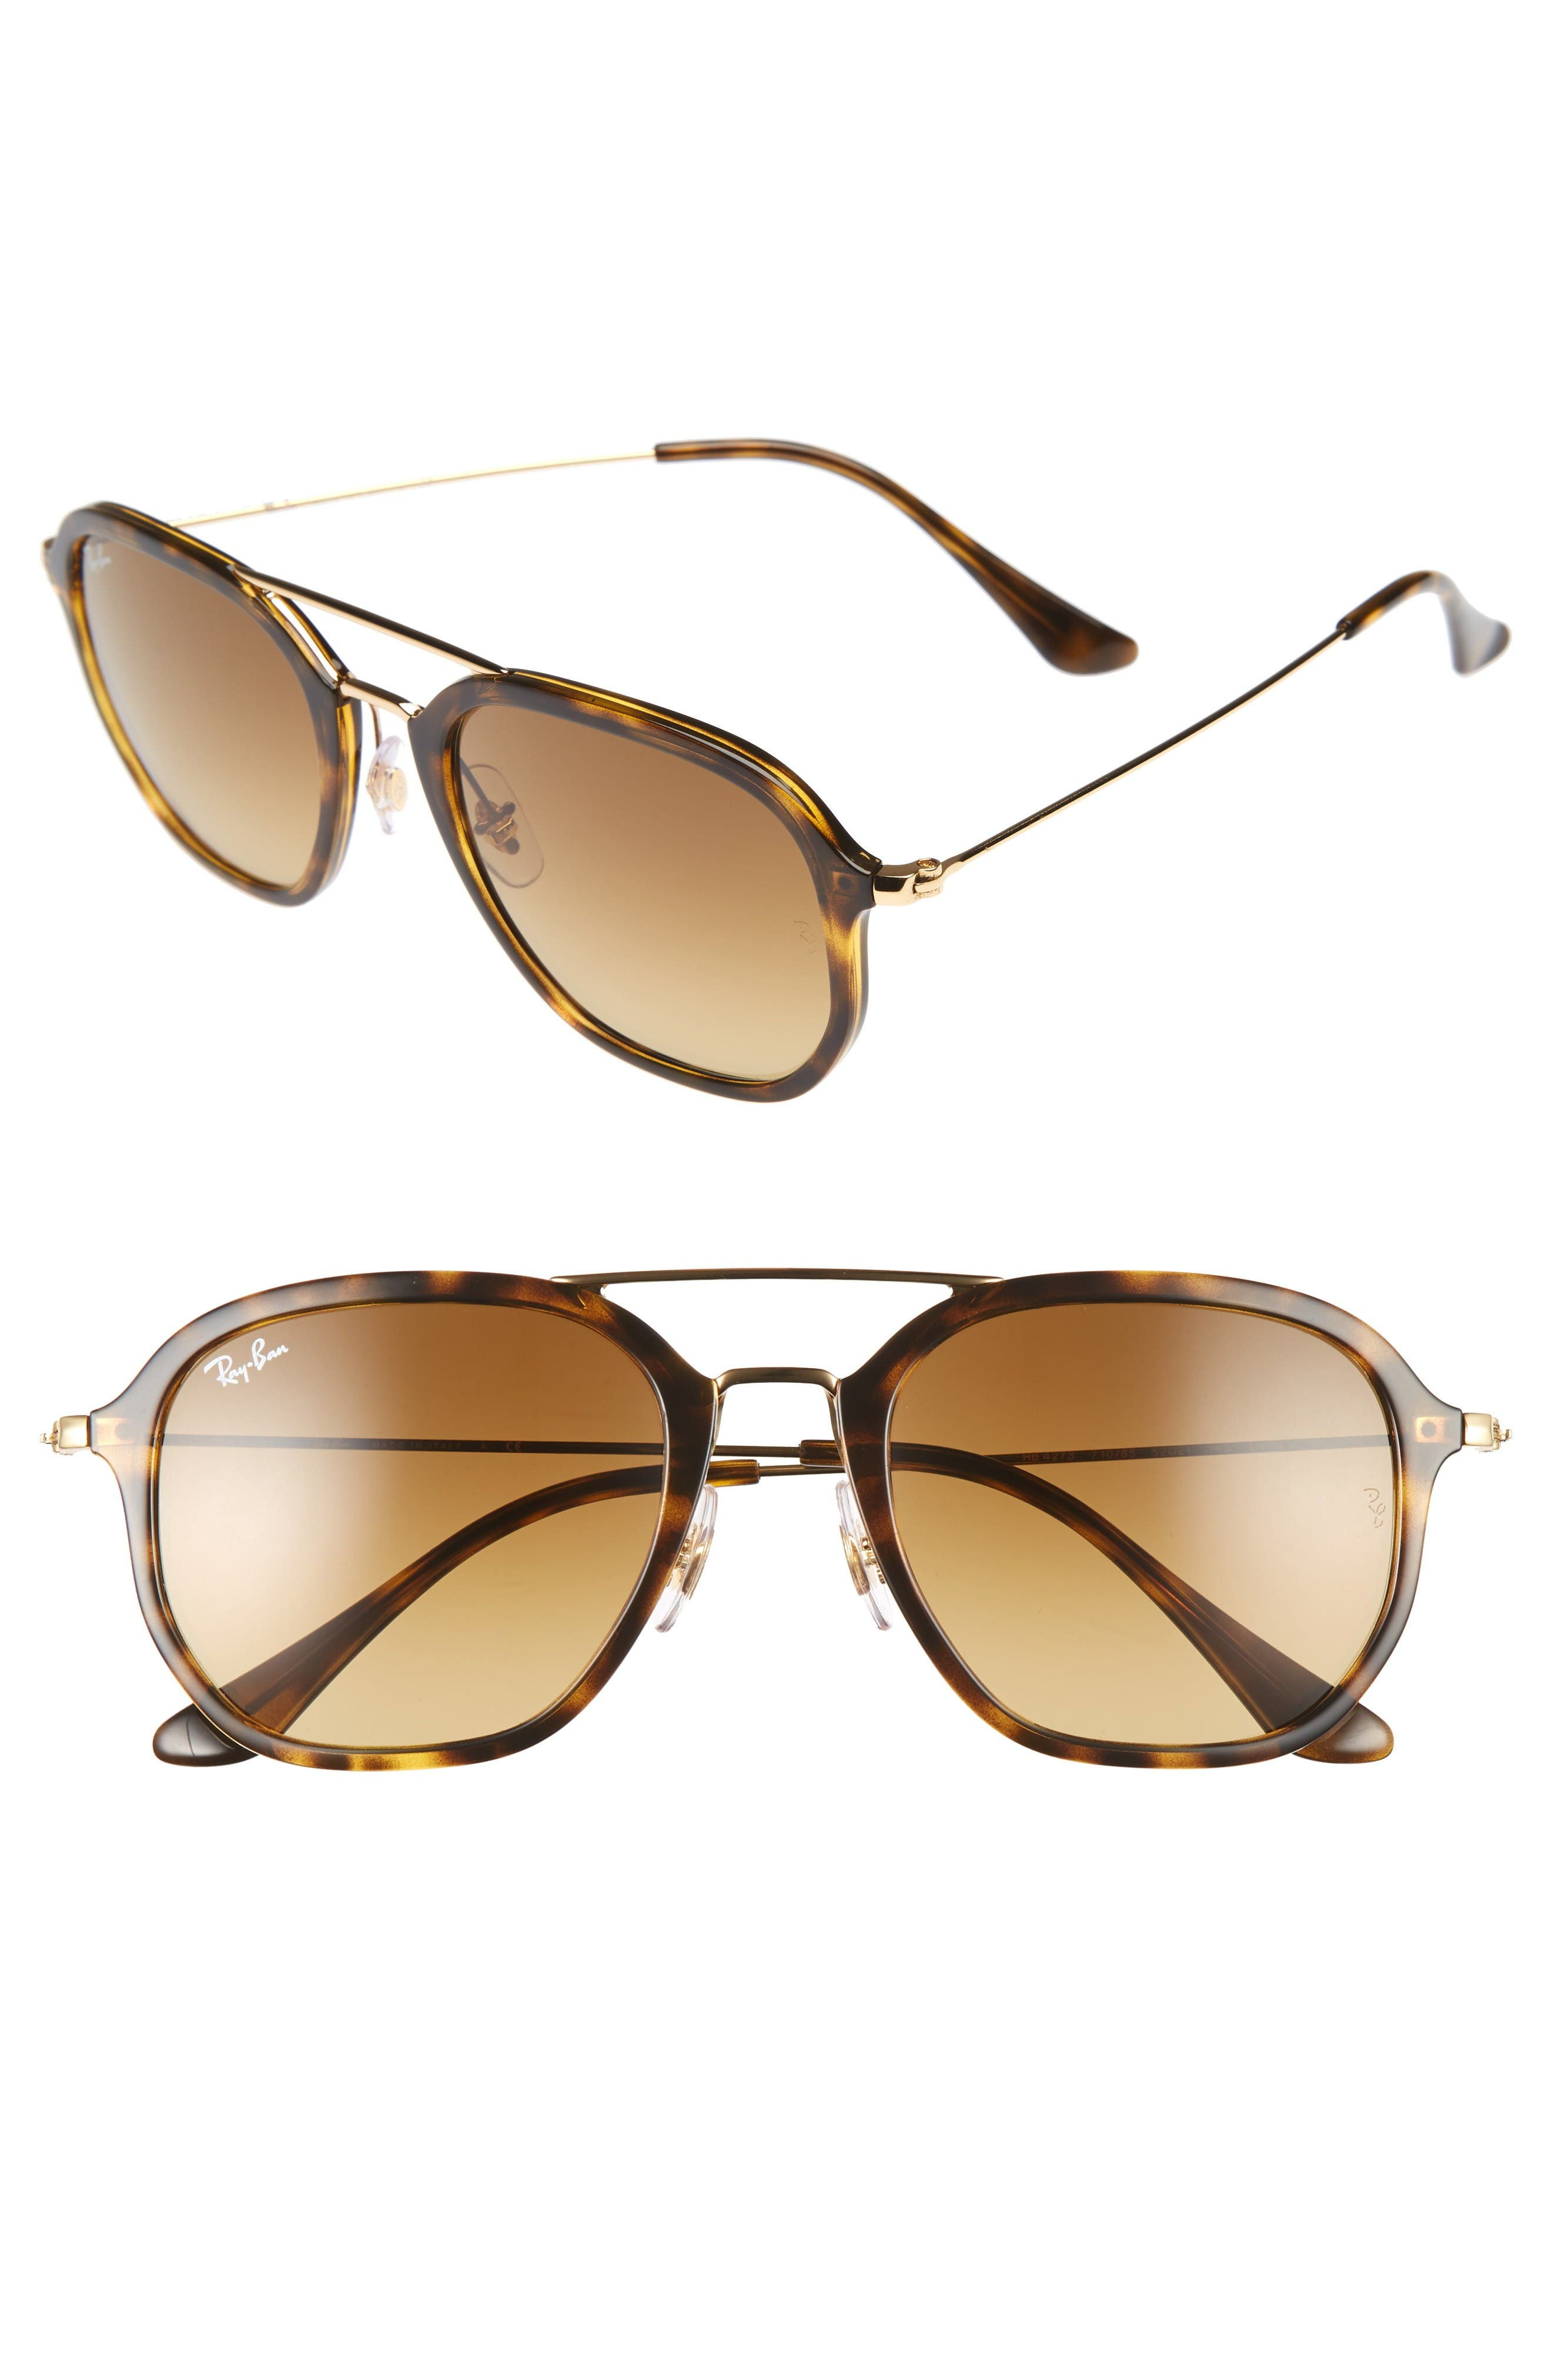 52mm Square Sunglasses,                         Main,                         color, Havana